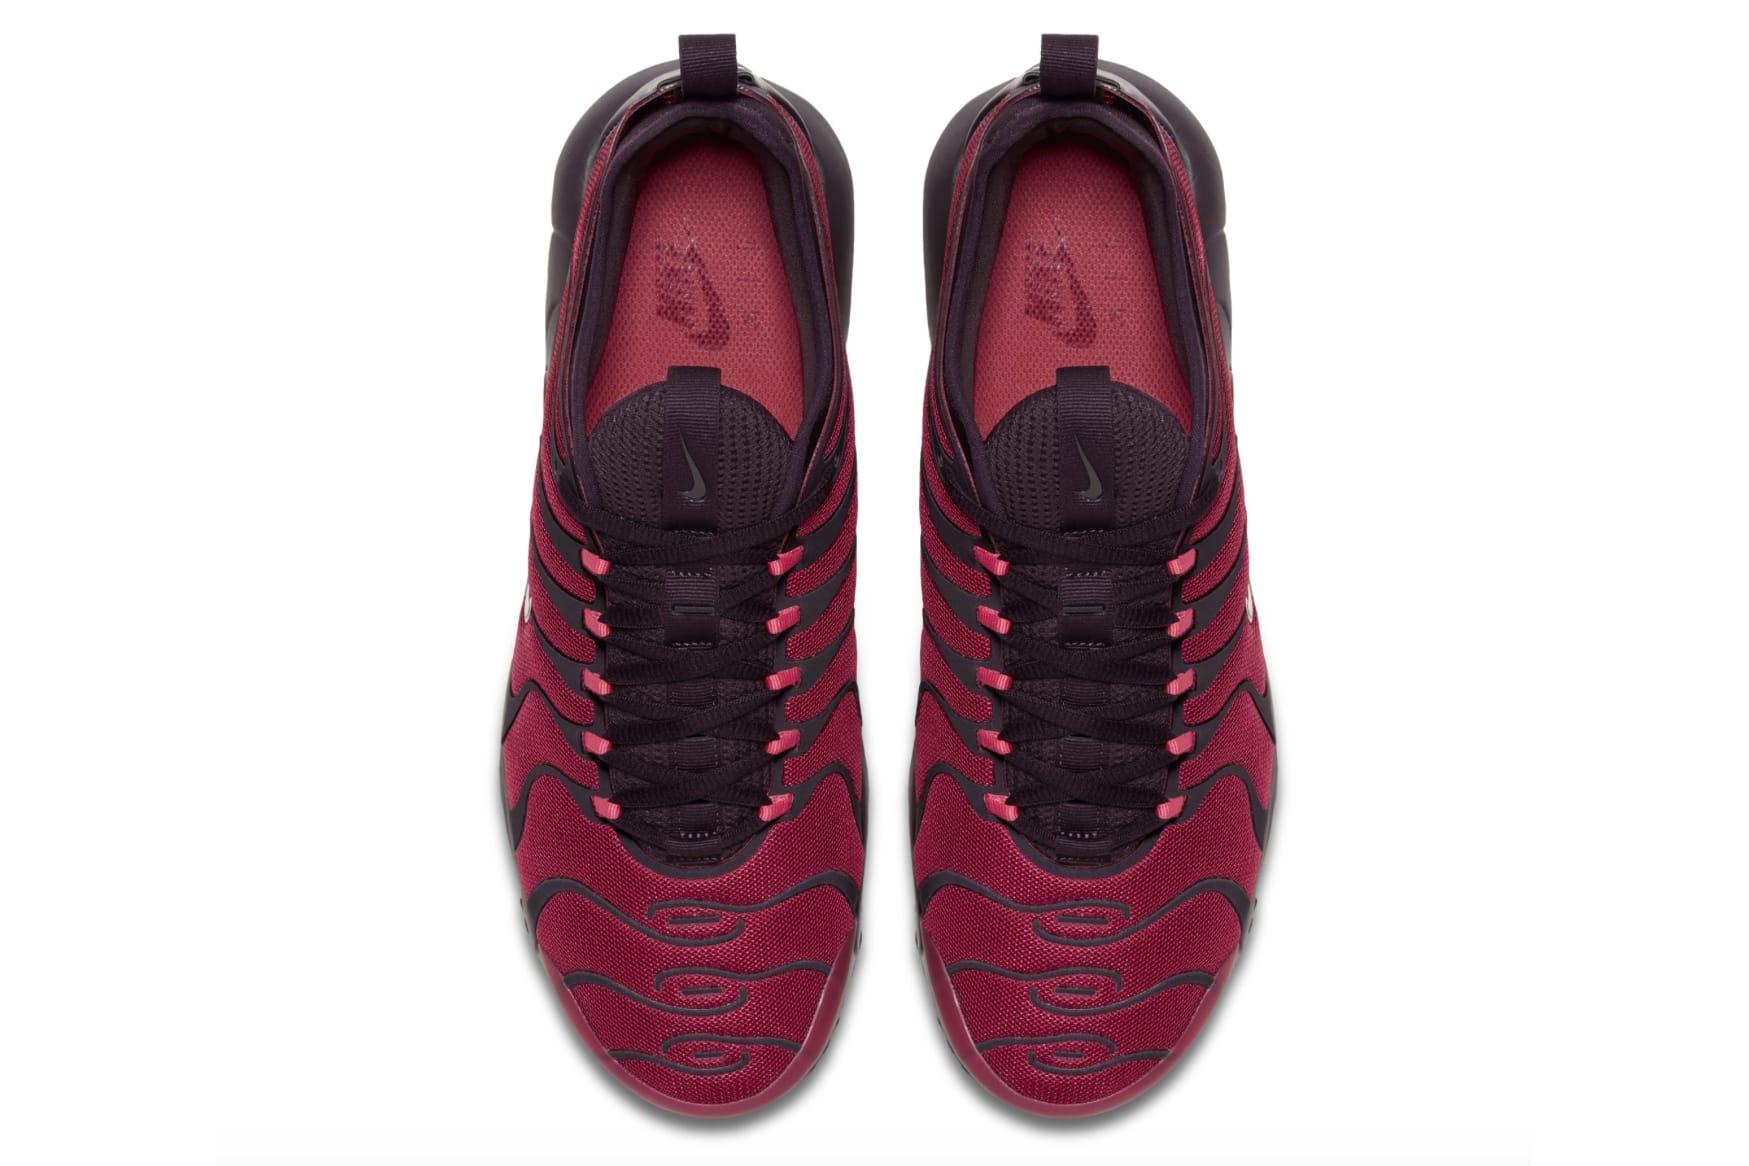 Nike Air Max Plus TN Ultra Burgundy